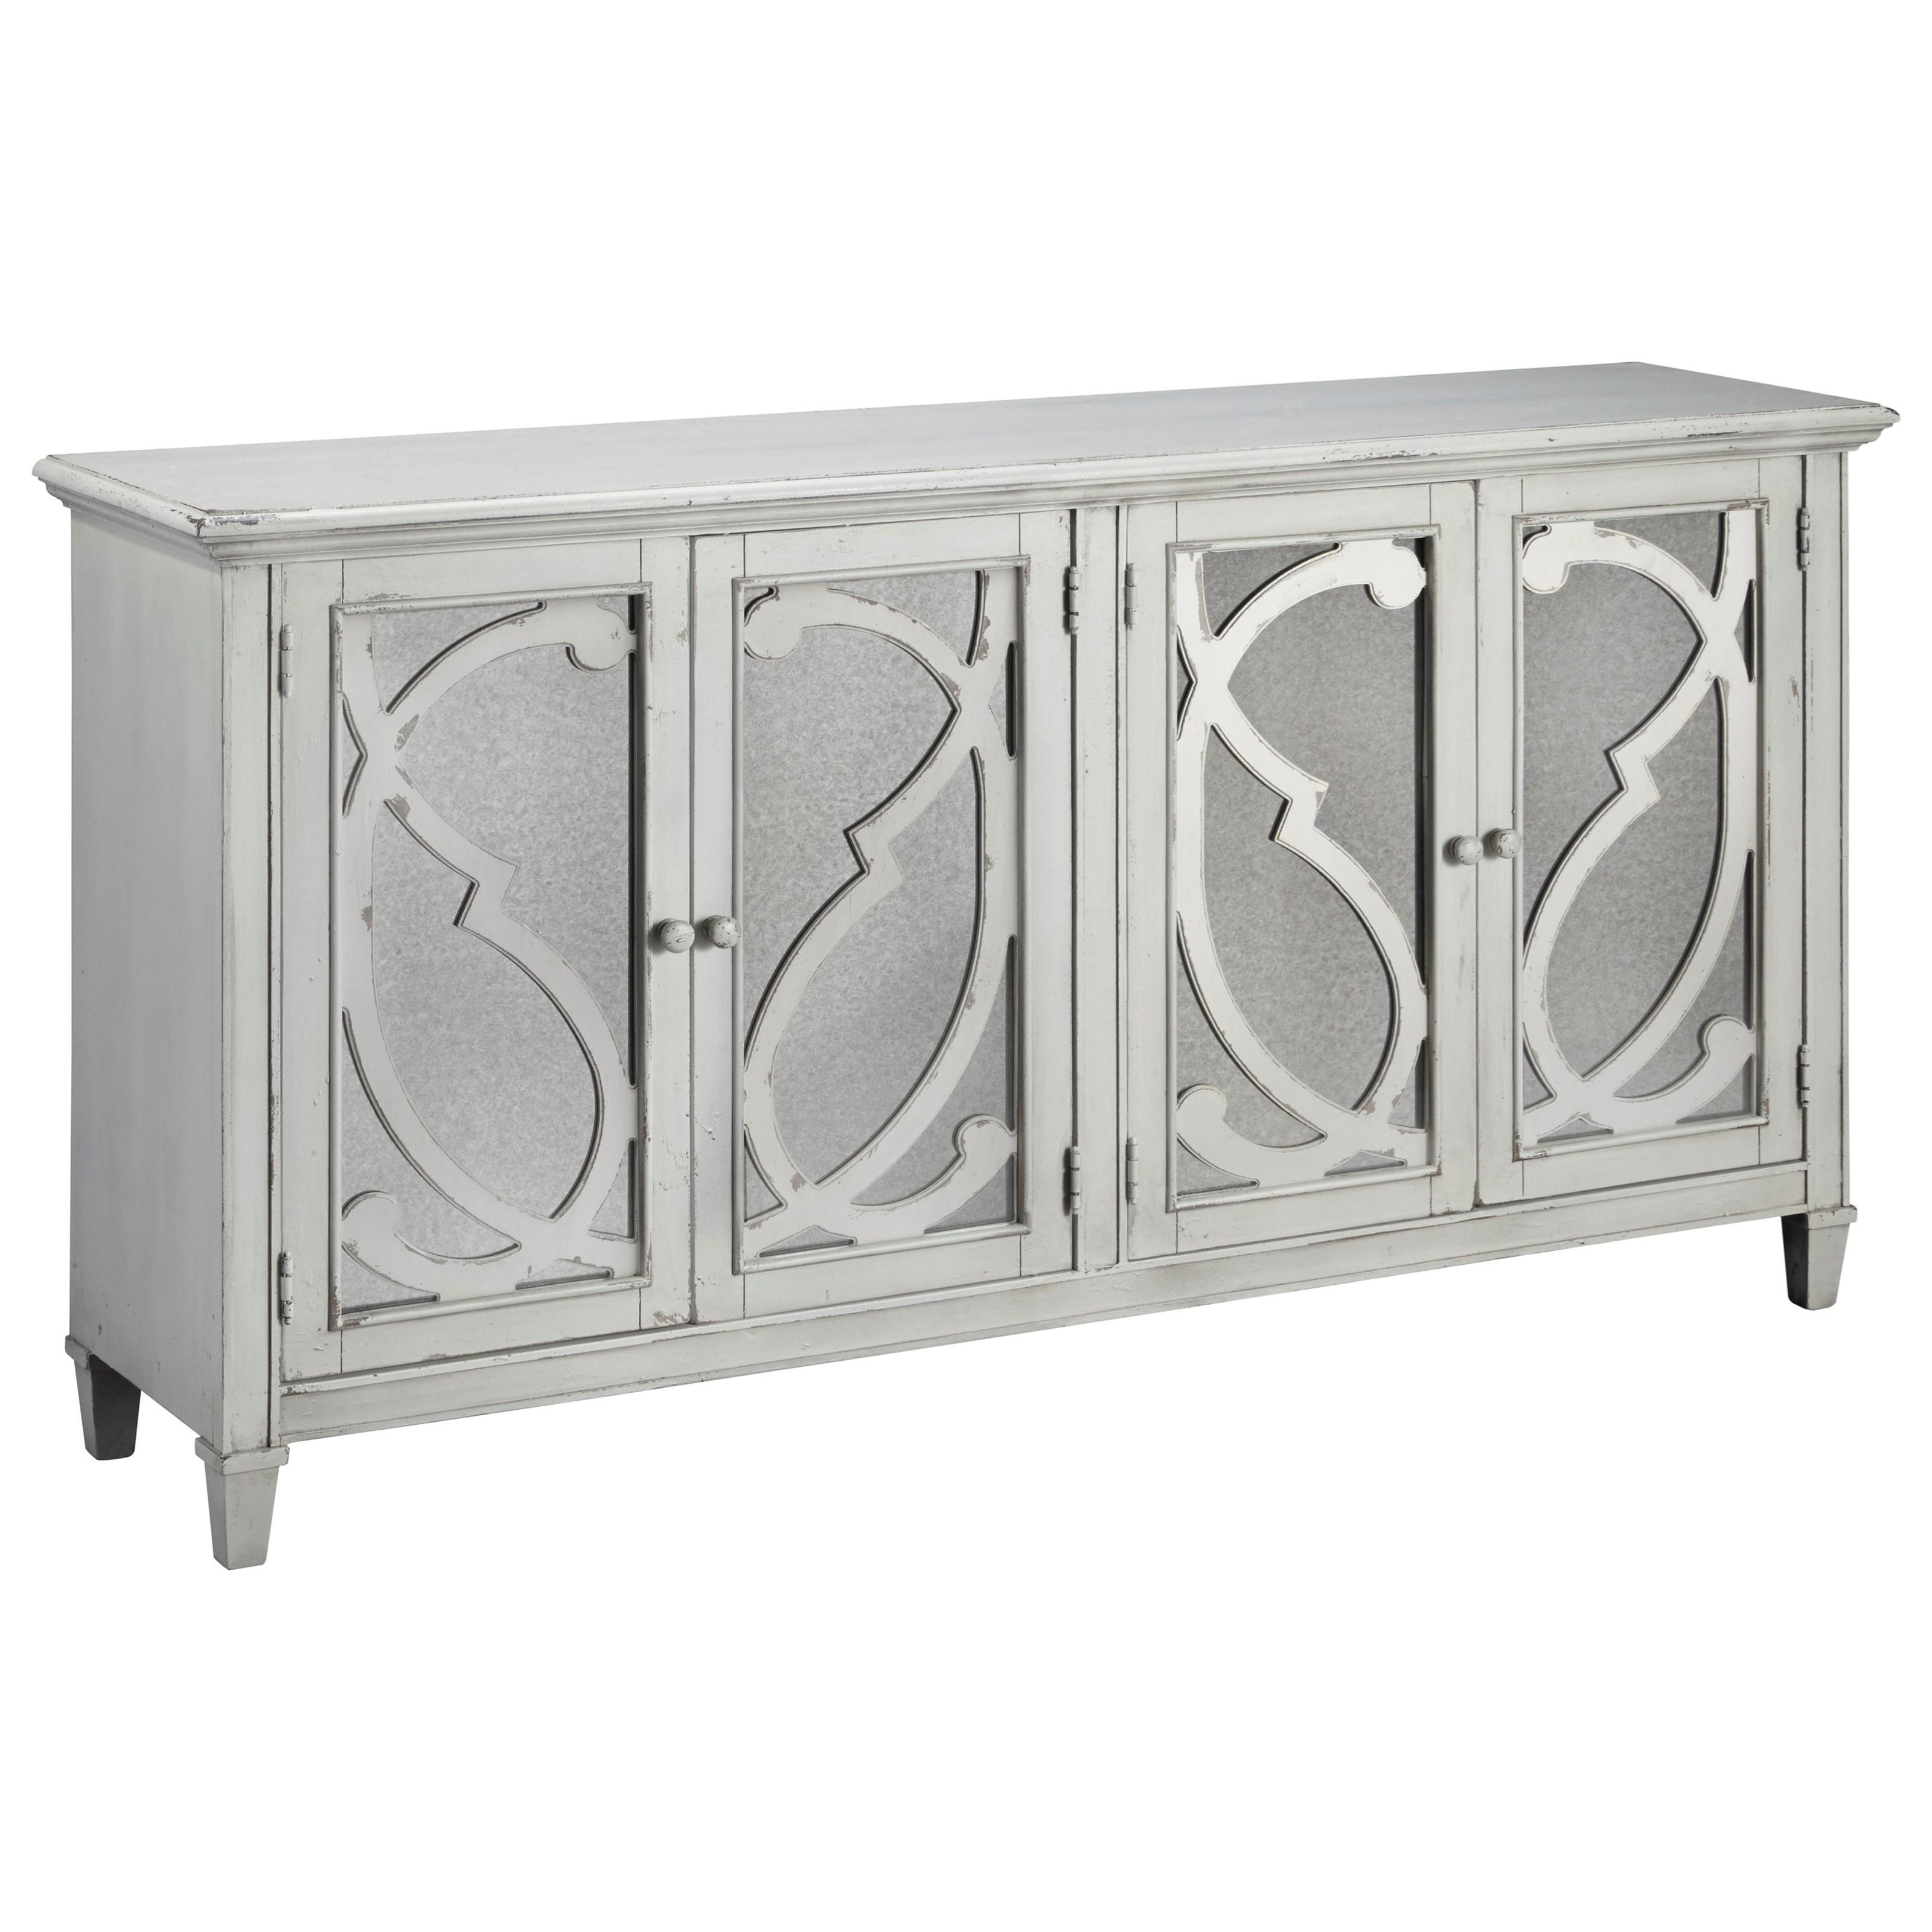 Mirimyn Door Accent Cabinet by Signature at Walker's Furniture